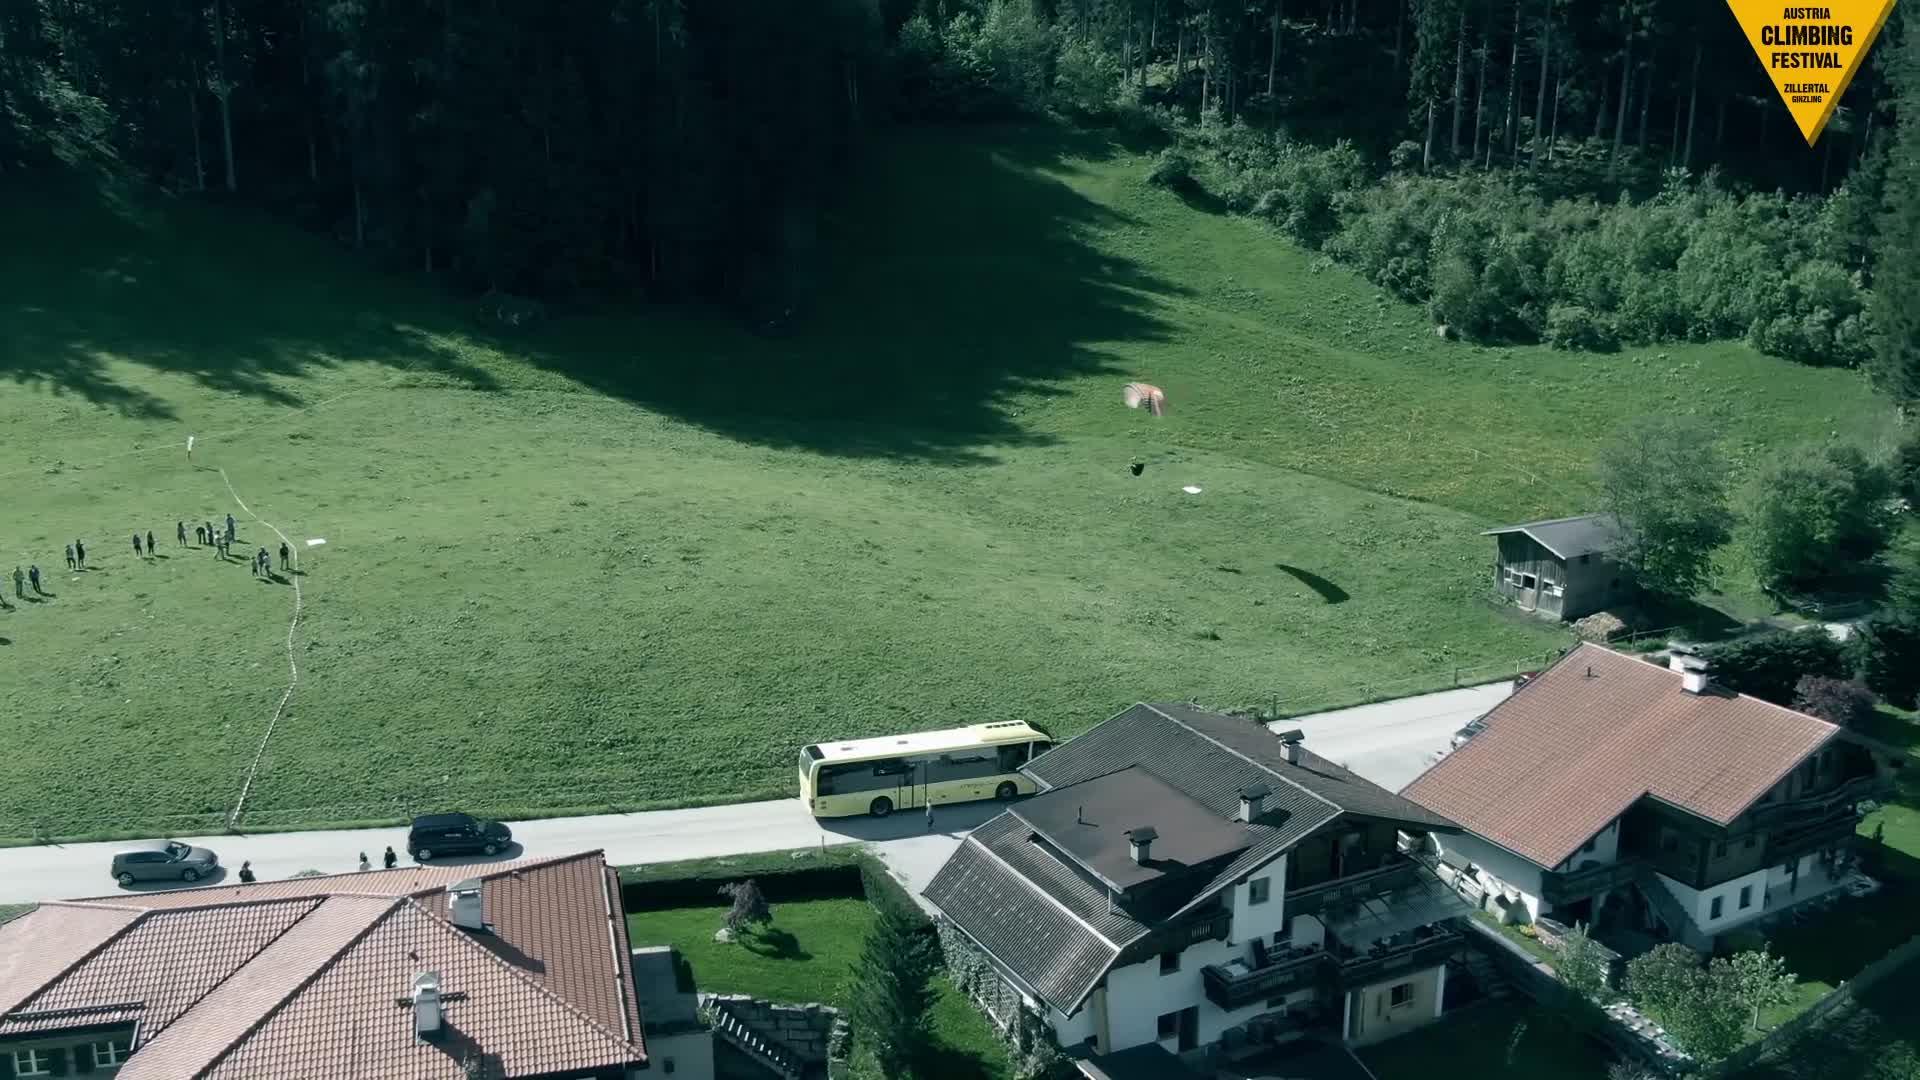 Austria Climbingfestival 2019 Ginzling